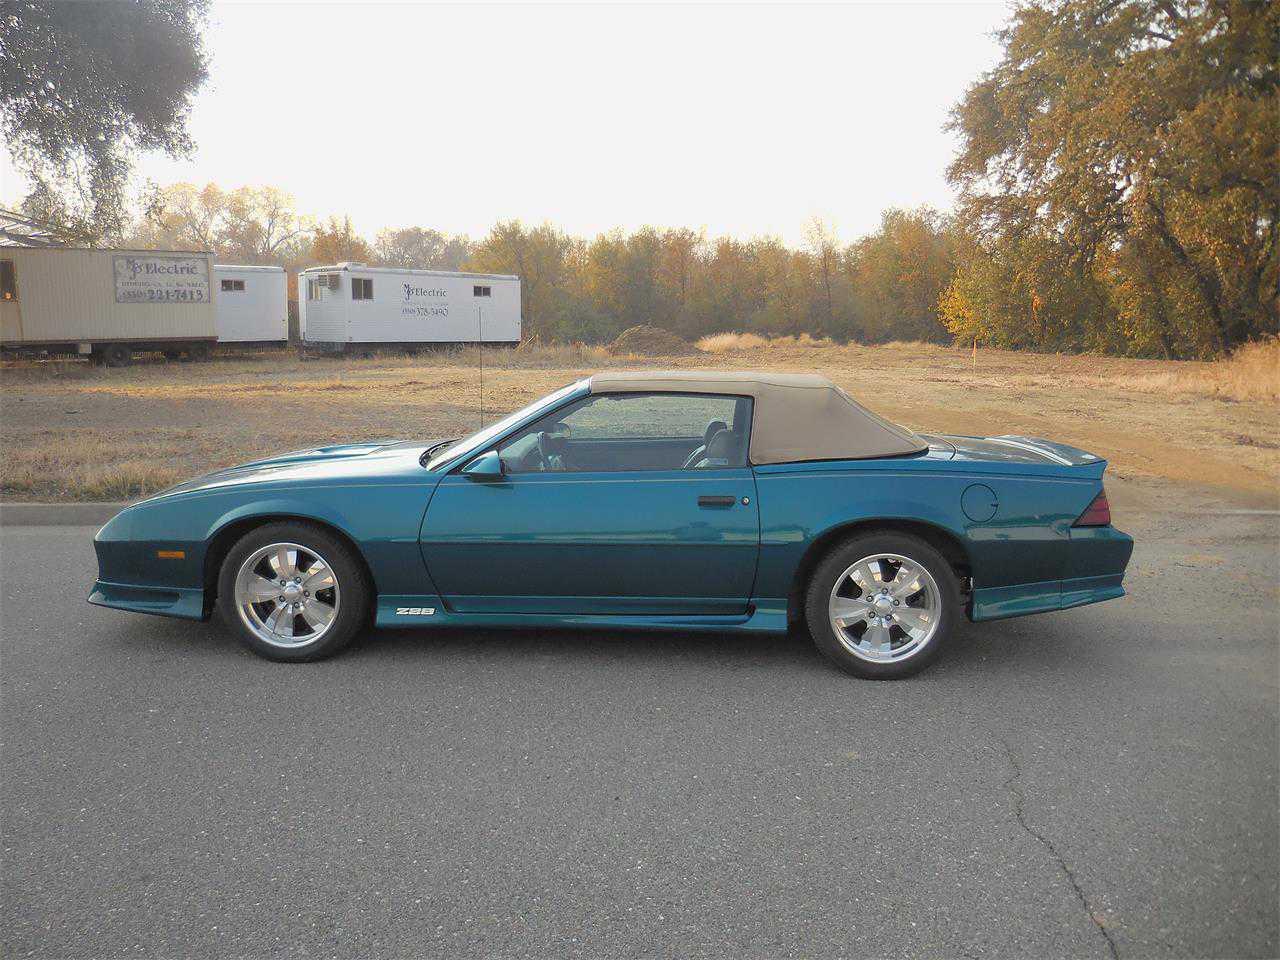 1992 Chevrolet Camaro Z28 for sale in Anderson, CA